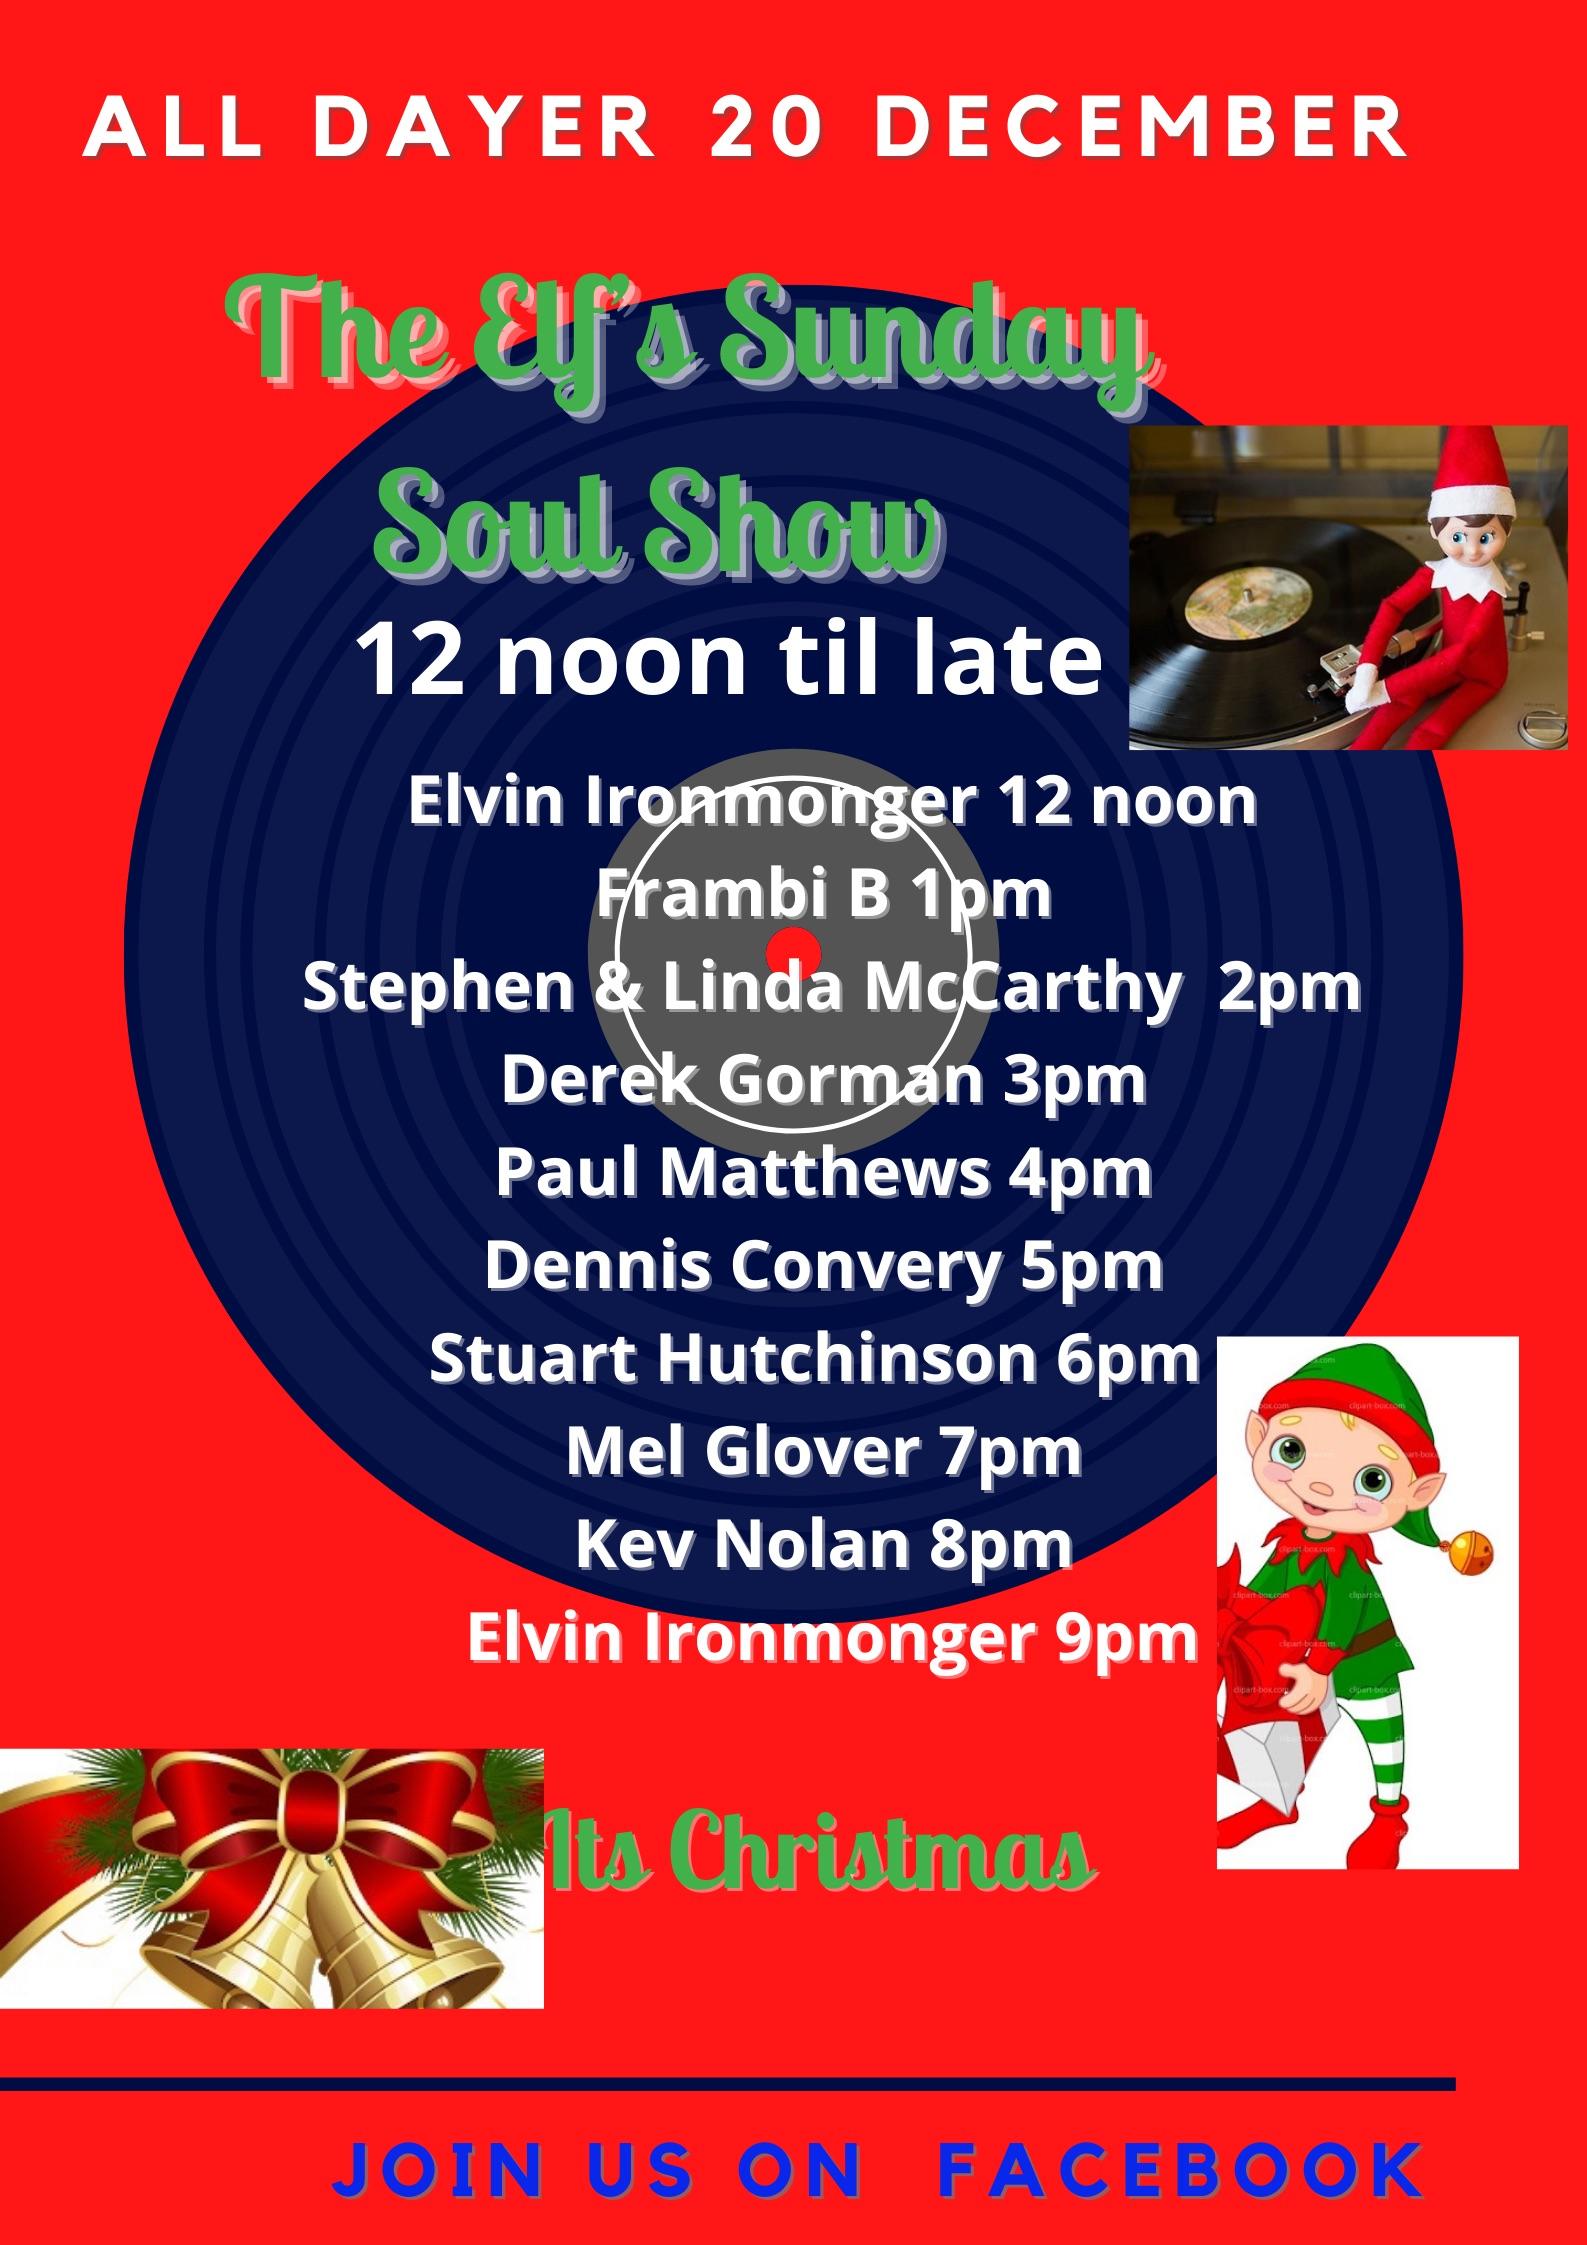 The Elfs Sunday Soul Show flyer